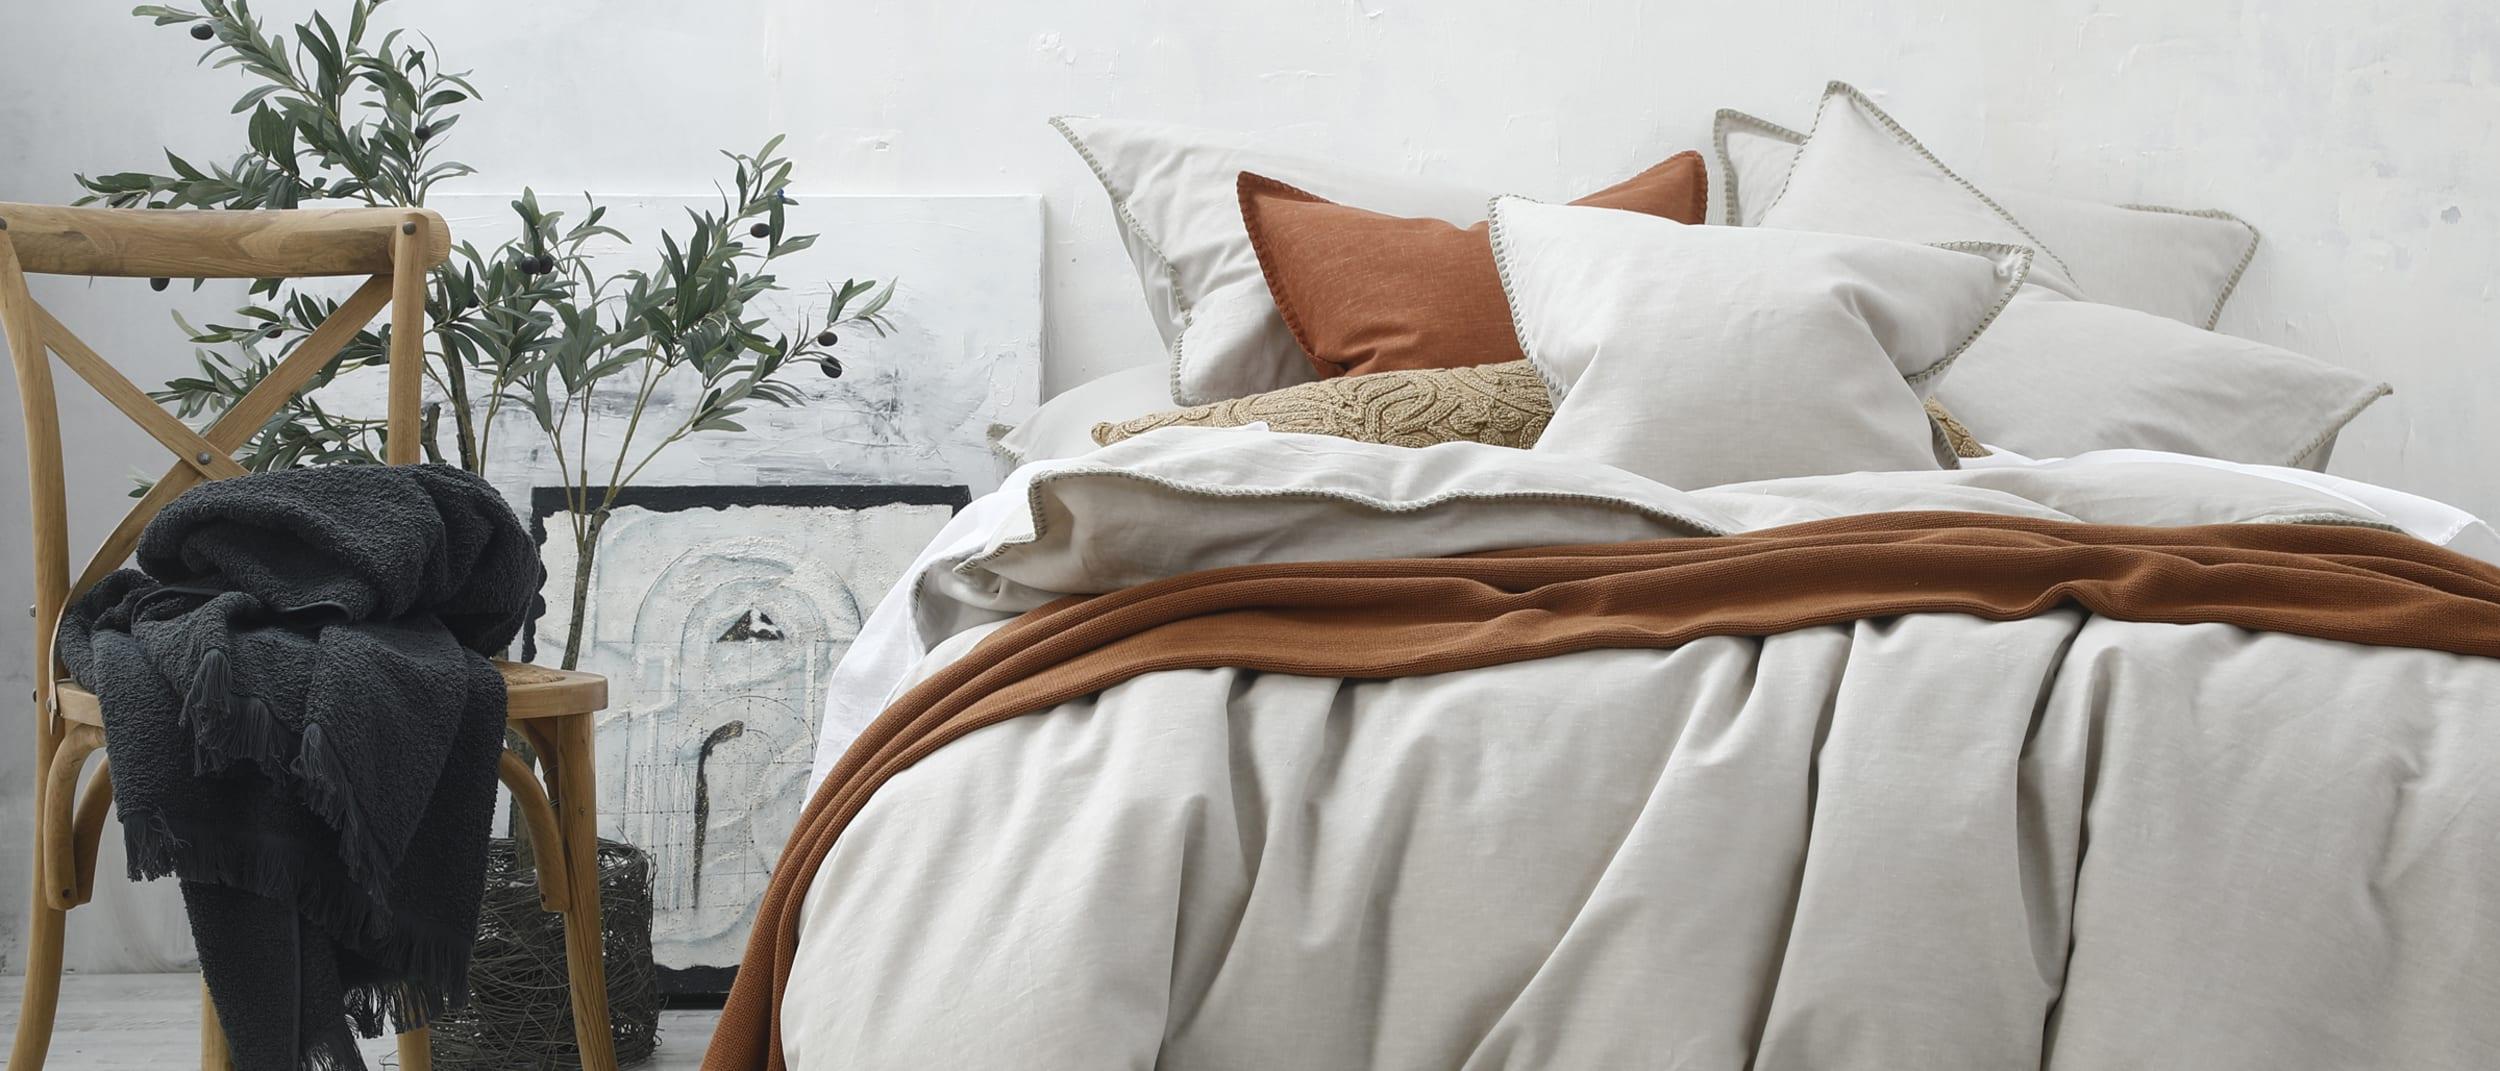 M.M Linen: Stitch linen cotton range 30% off* full range